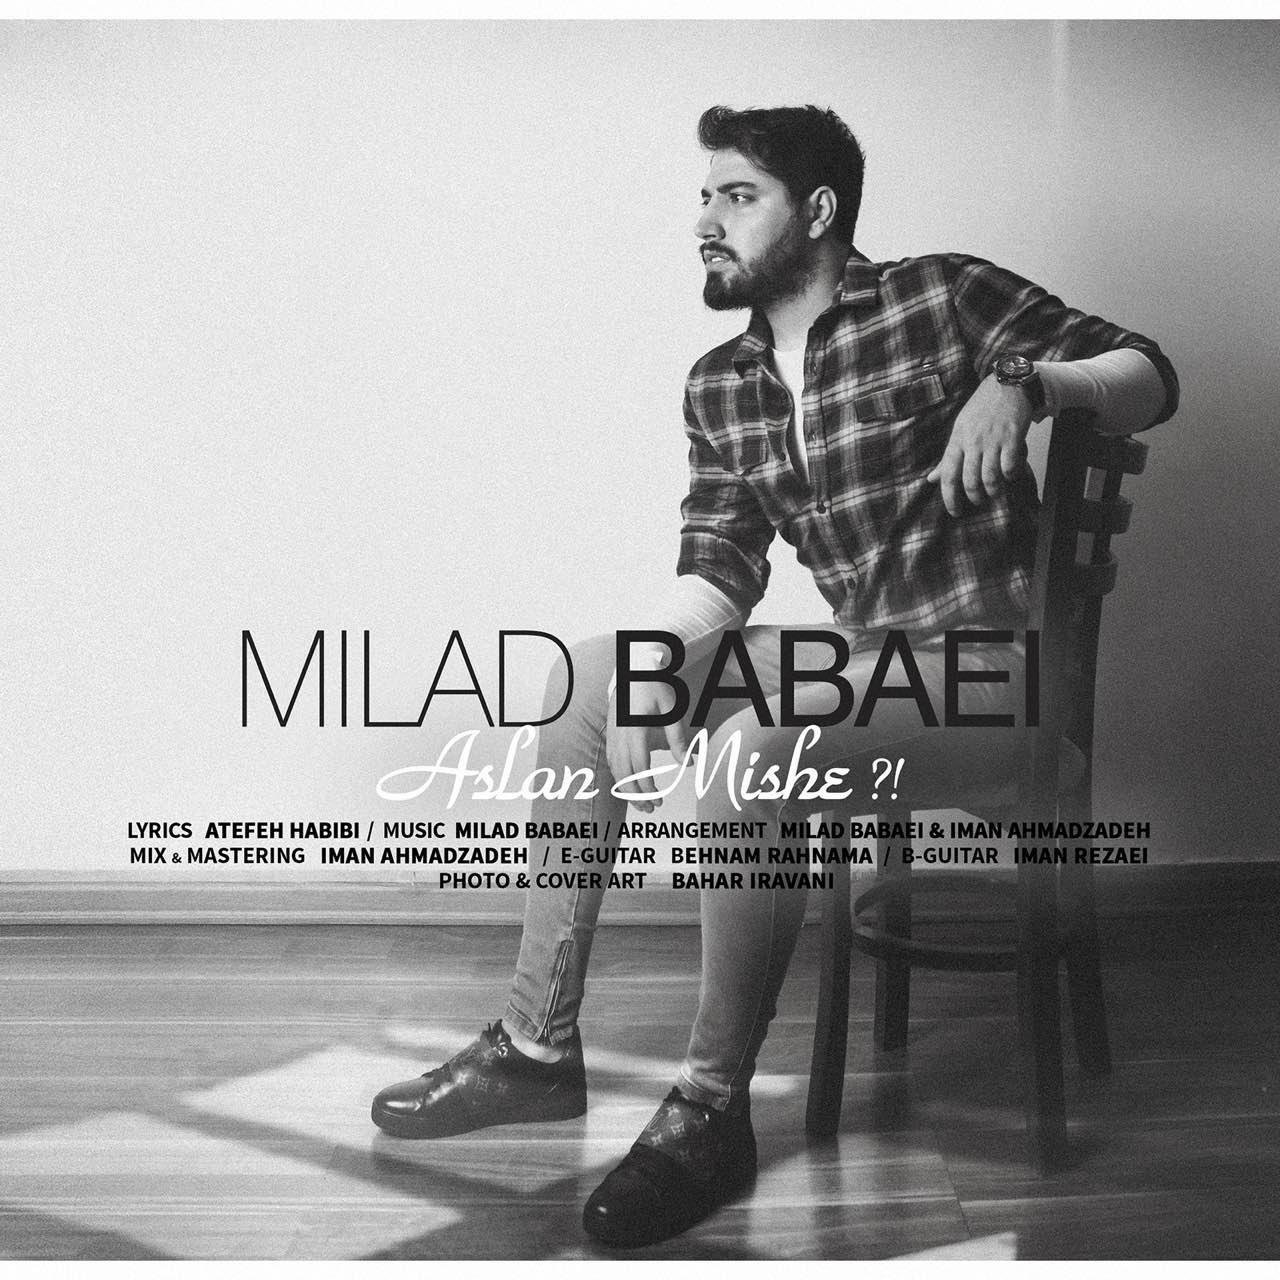 Milad Babaei – Aslan Mishe